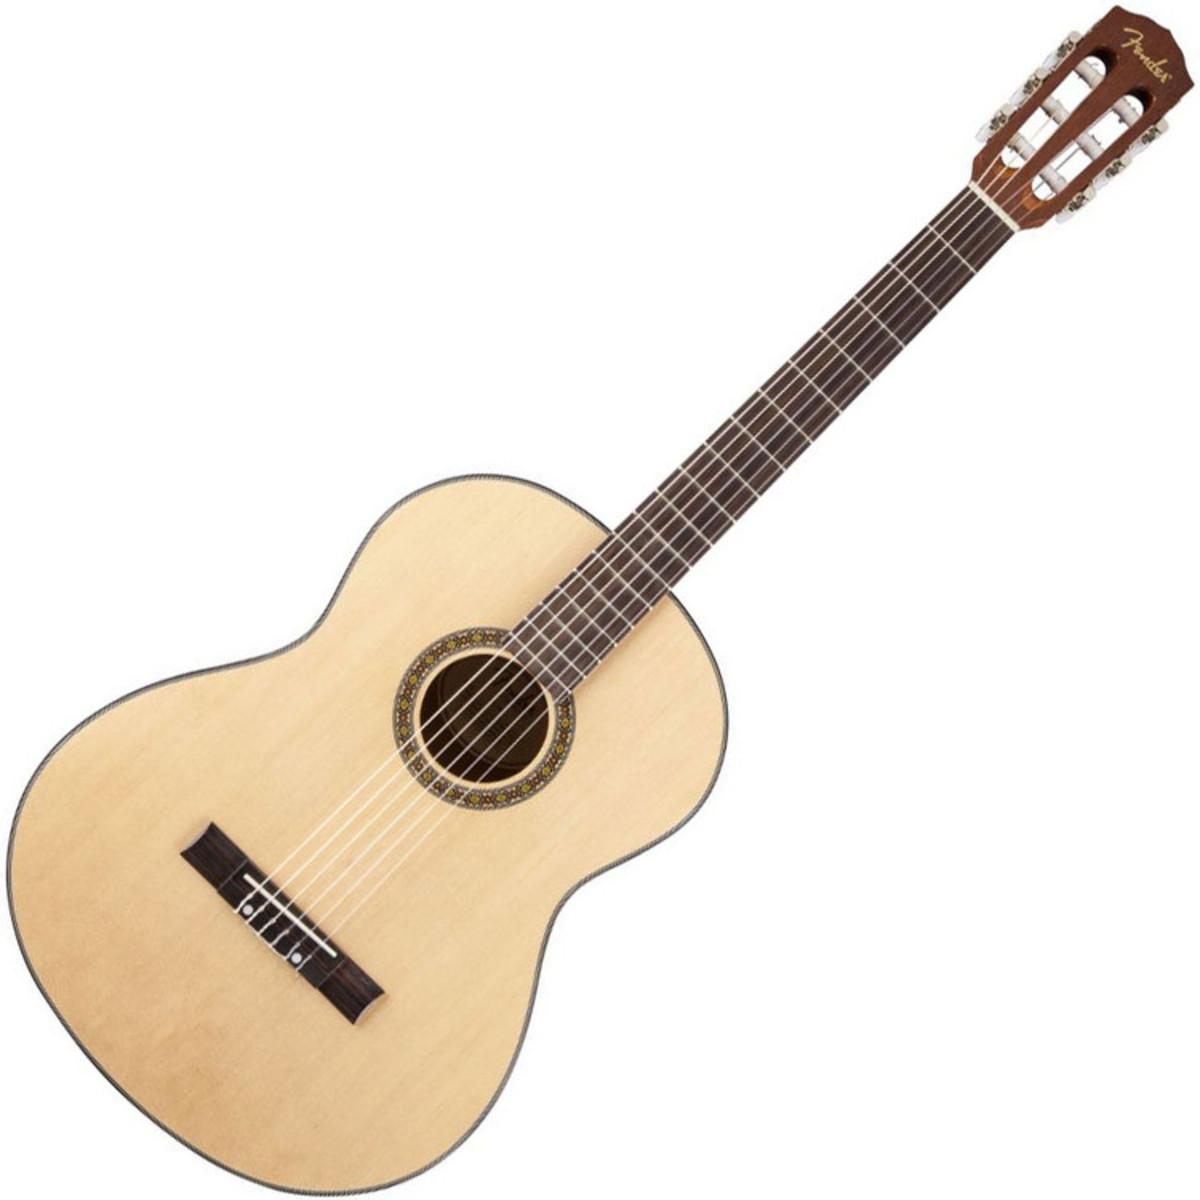 fender pack guitare acoustique classique fc 100. Black Bedroom Furniture Sets. Home Design Ideas